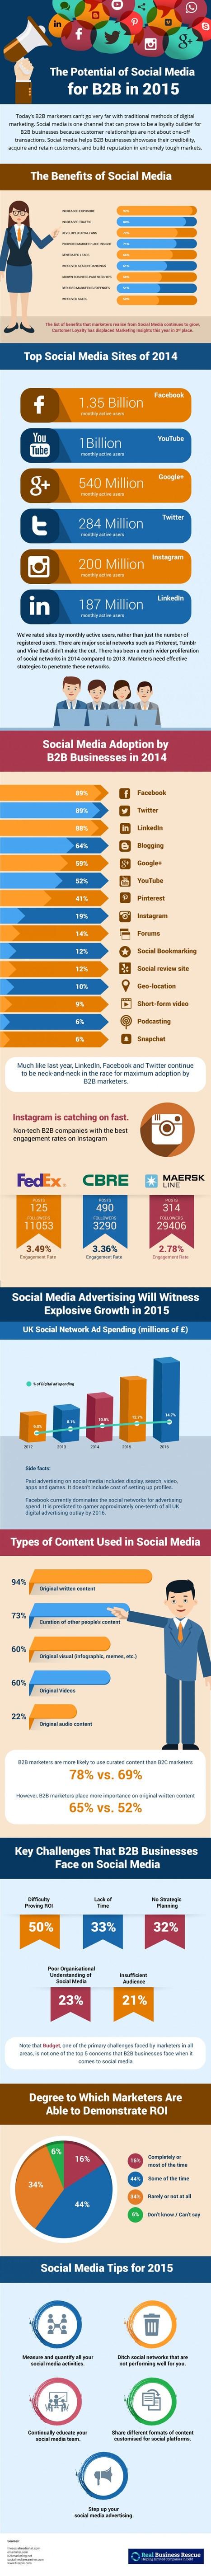 How B2B Businesses Are Tackling Social Media In 2015 | Social Media, Digital Marketing | Scoop.it